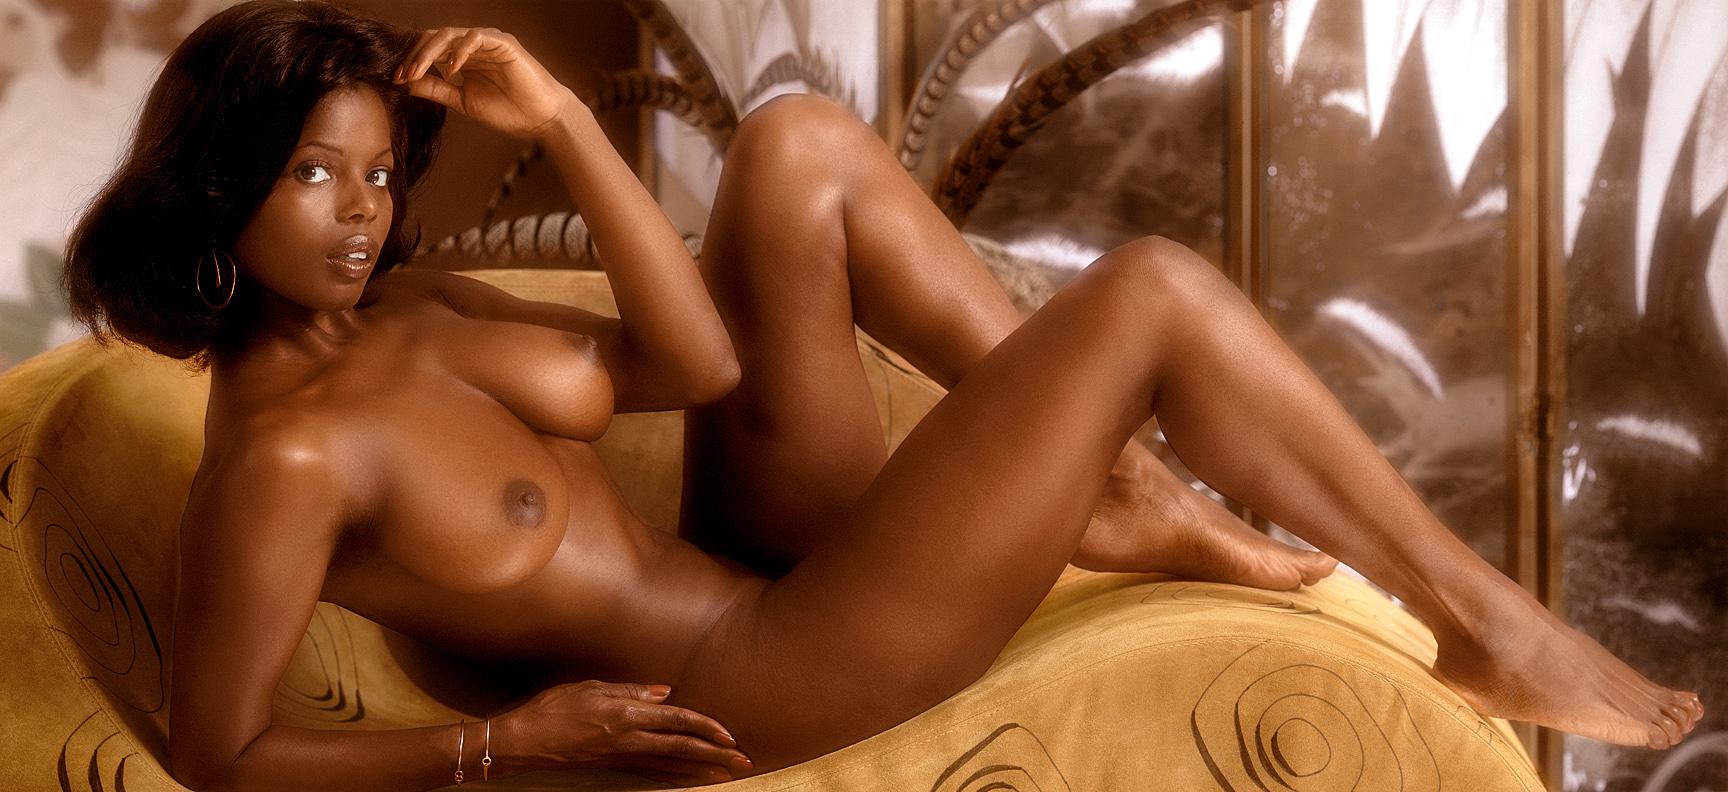 Women nude group-7216